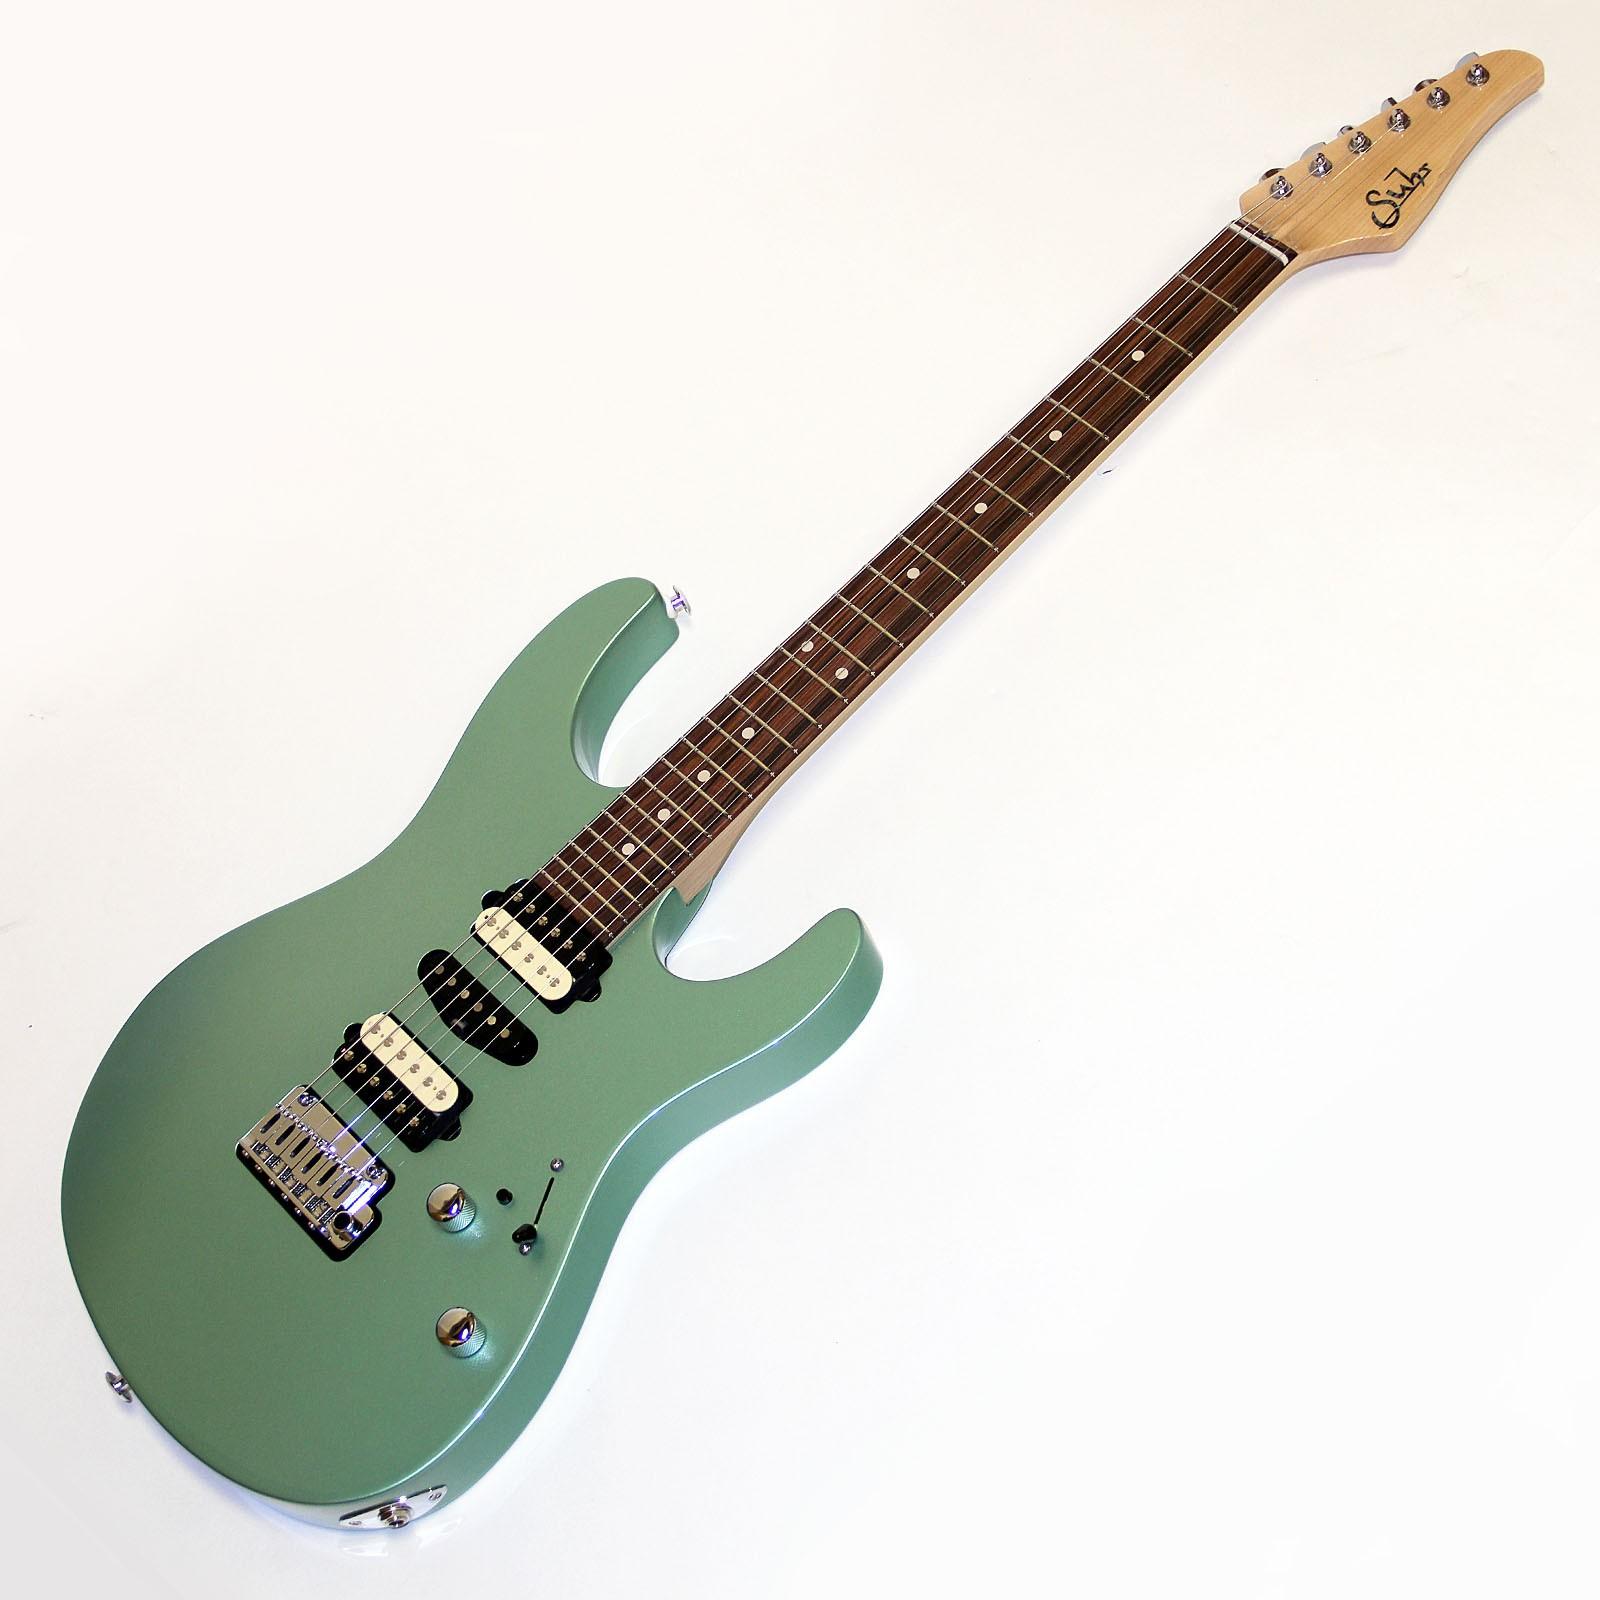 Suhr Pickup Wiring Diagram Pick Up Strat Guitar Modern Cactus Green Metallic Stratocaster Culture 1600x1600